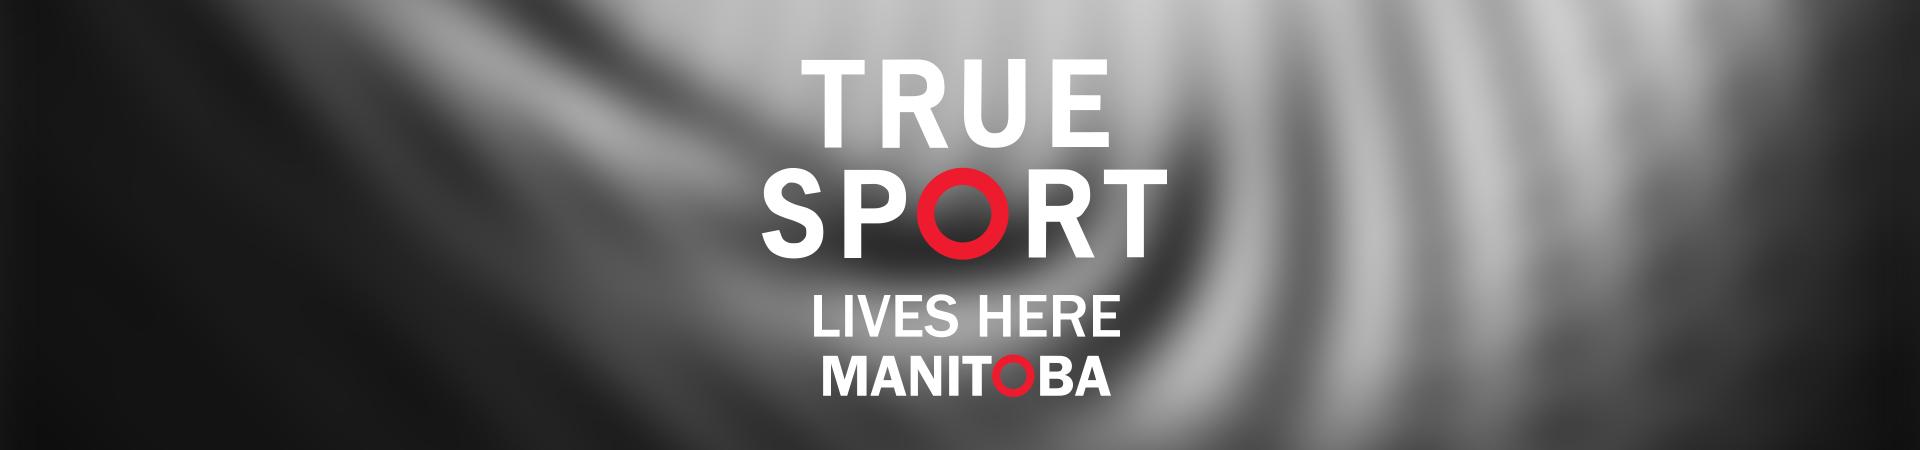 True Sport Lives Here Manitoba